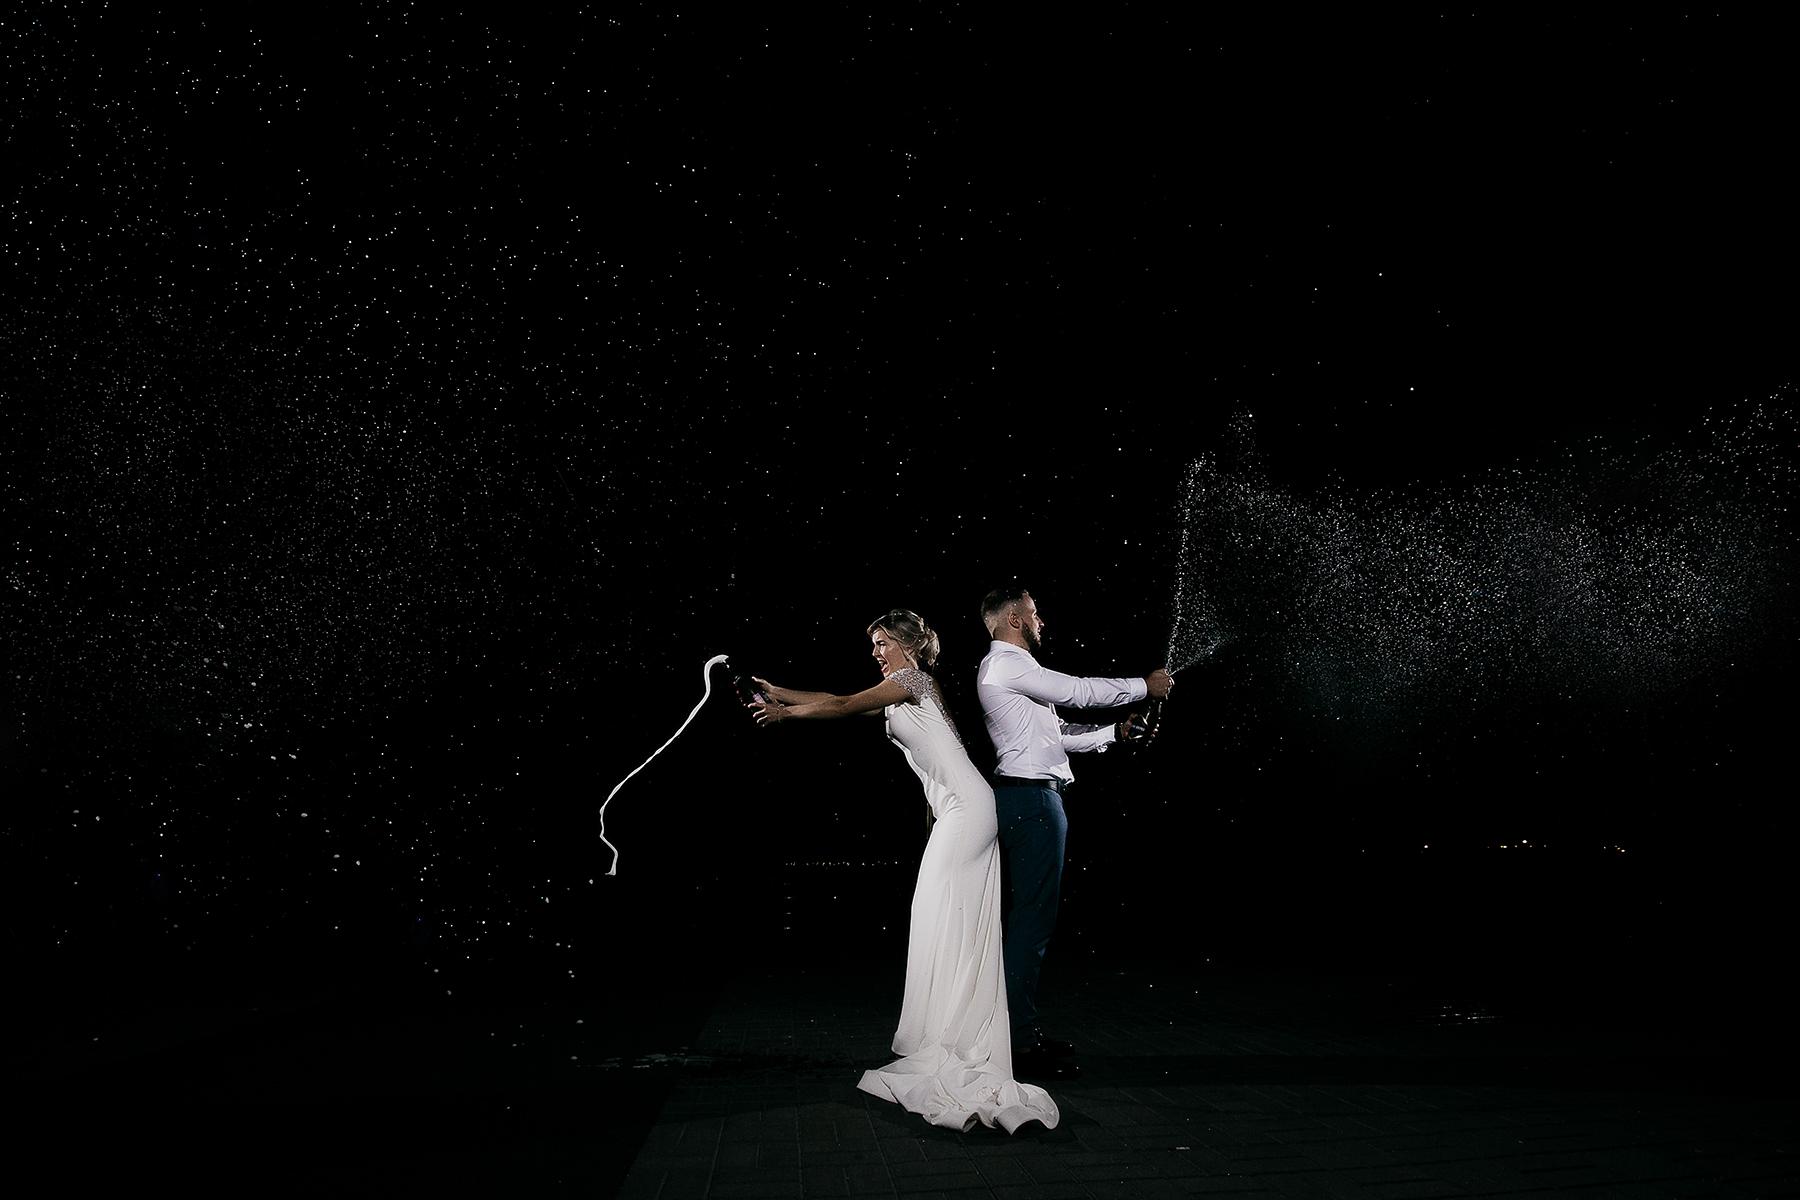 Ирина Макарова в Воронеже